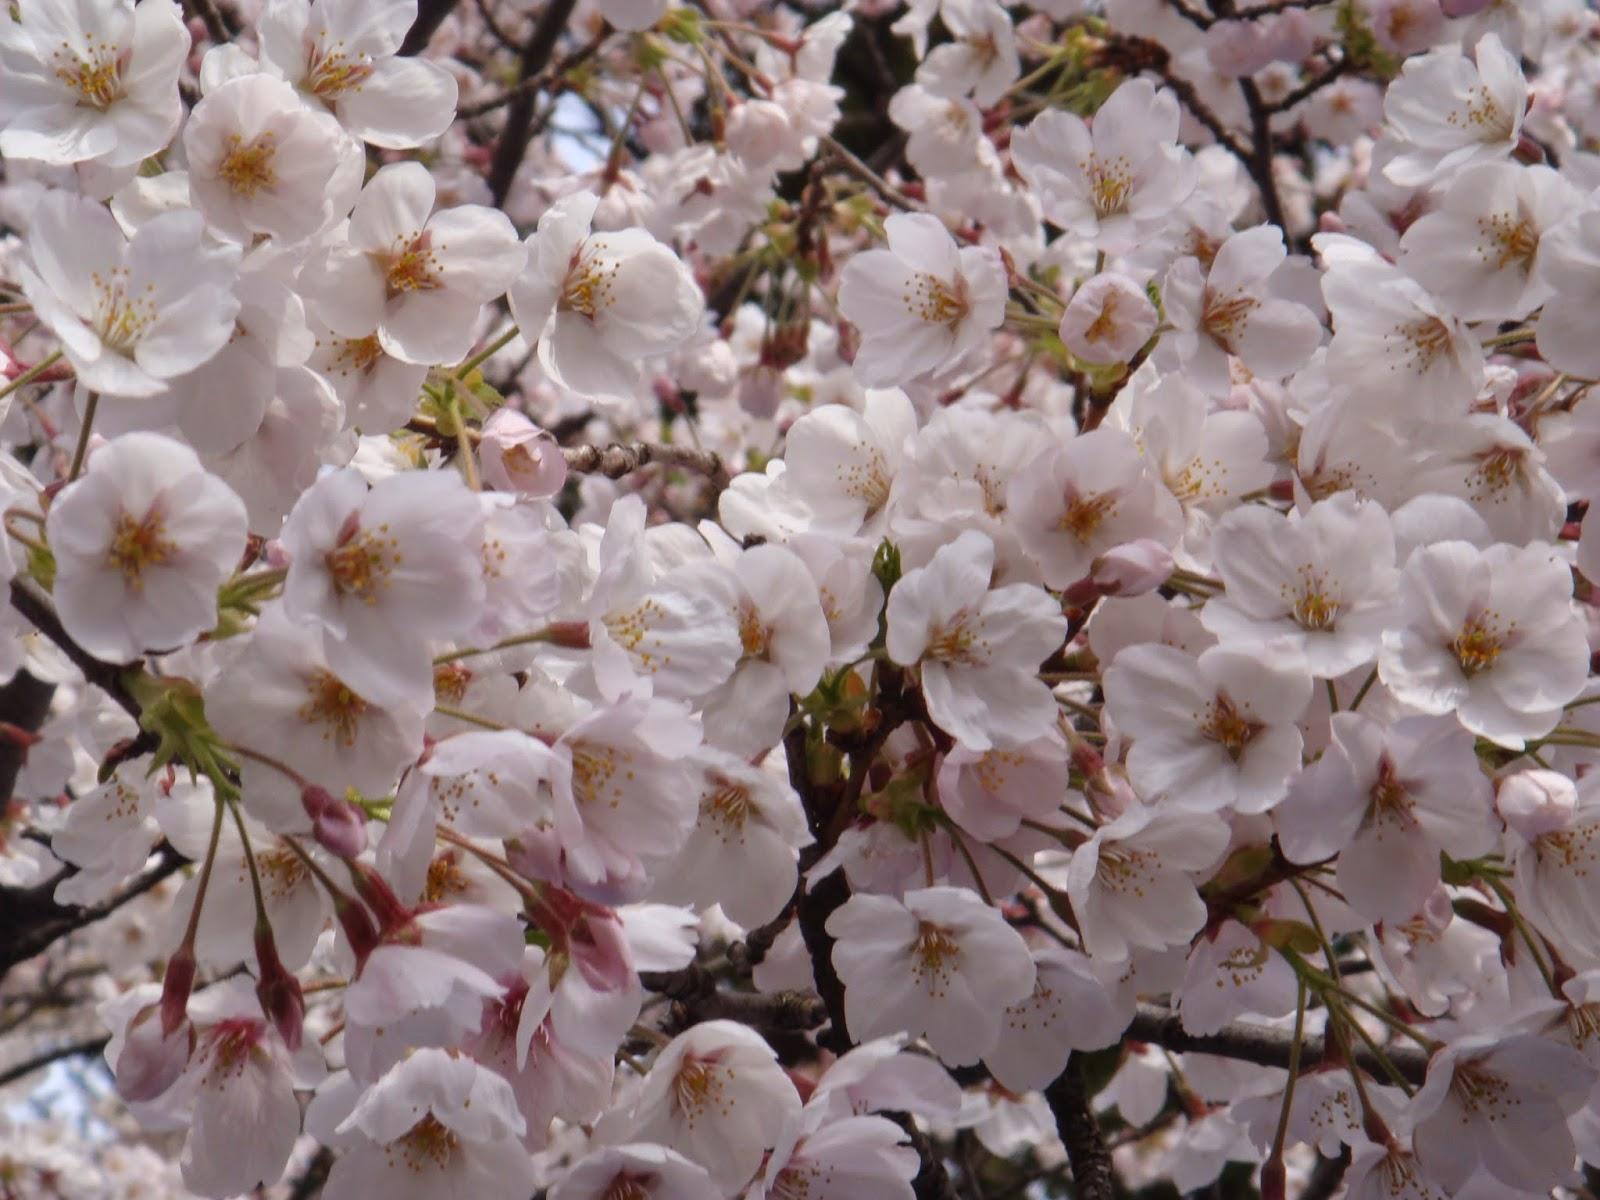 Jual Bibit Pohon Sakura Jepang | Bunga Sakura